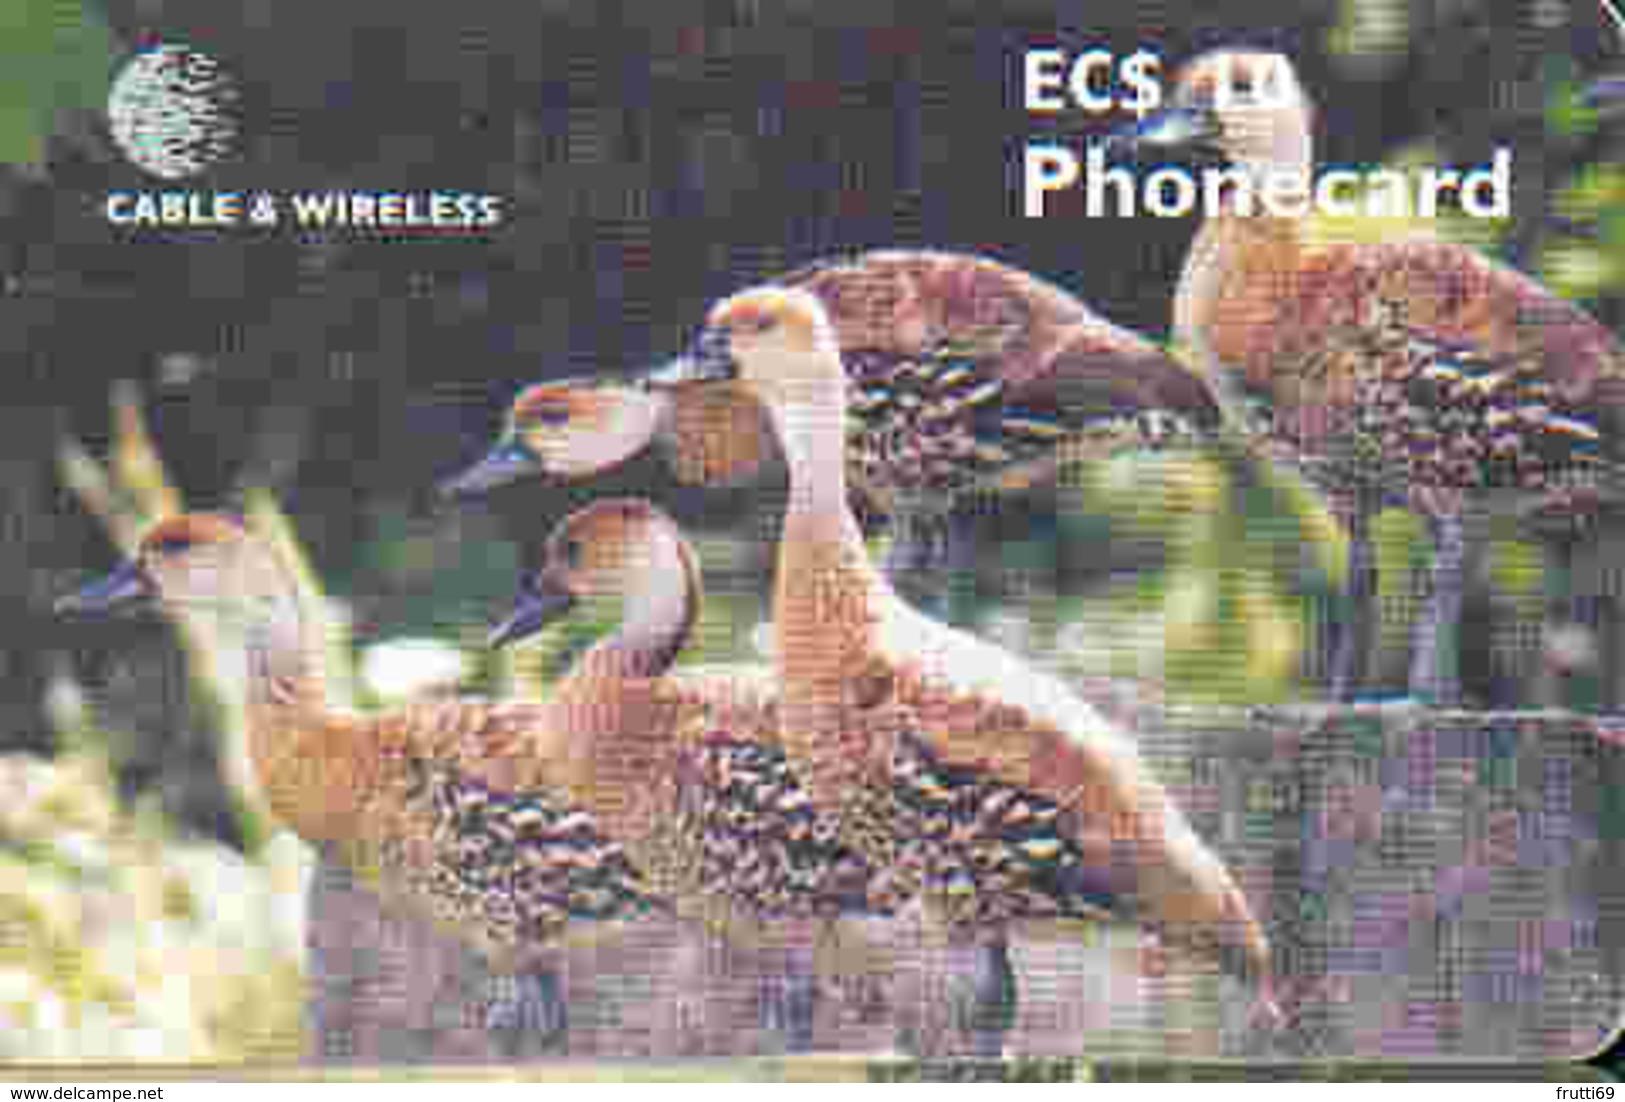 ANTIGUA & BARBUDA - TK 32553 Chip Indian Tree Duck - Antigua And Barbuda